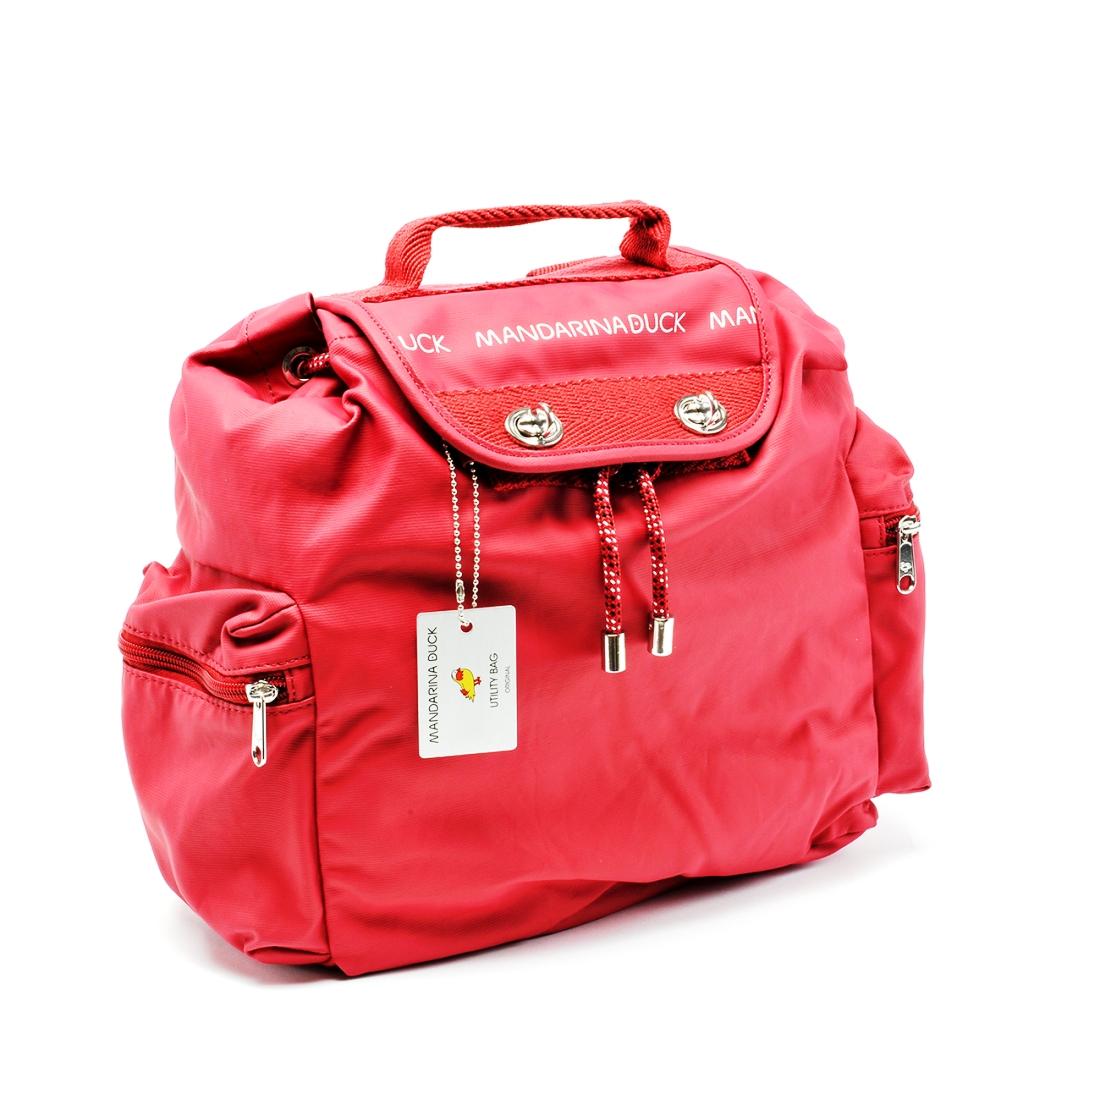 fe8037b3ba MANDARINA DUCK Zaino UTILITY HVT02 Brick Red - Bagsabout